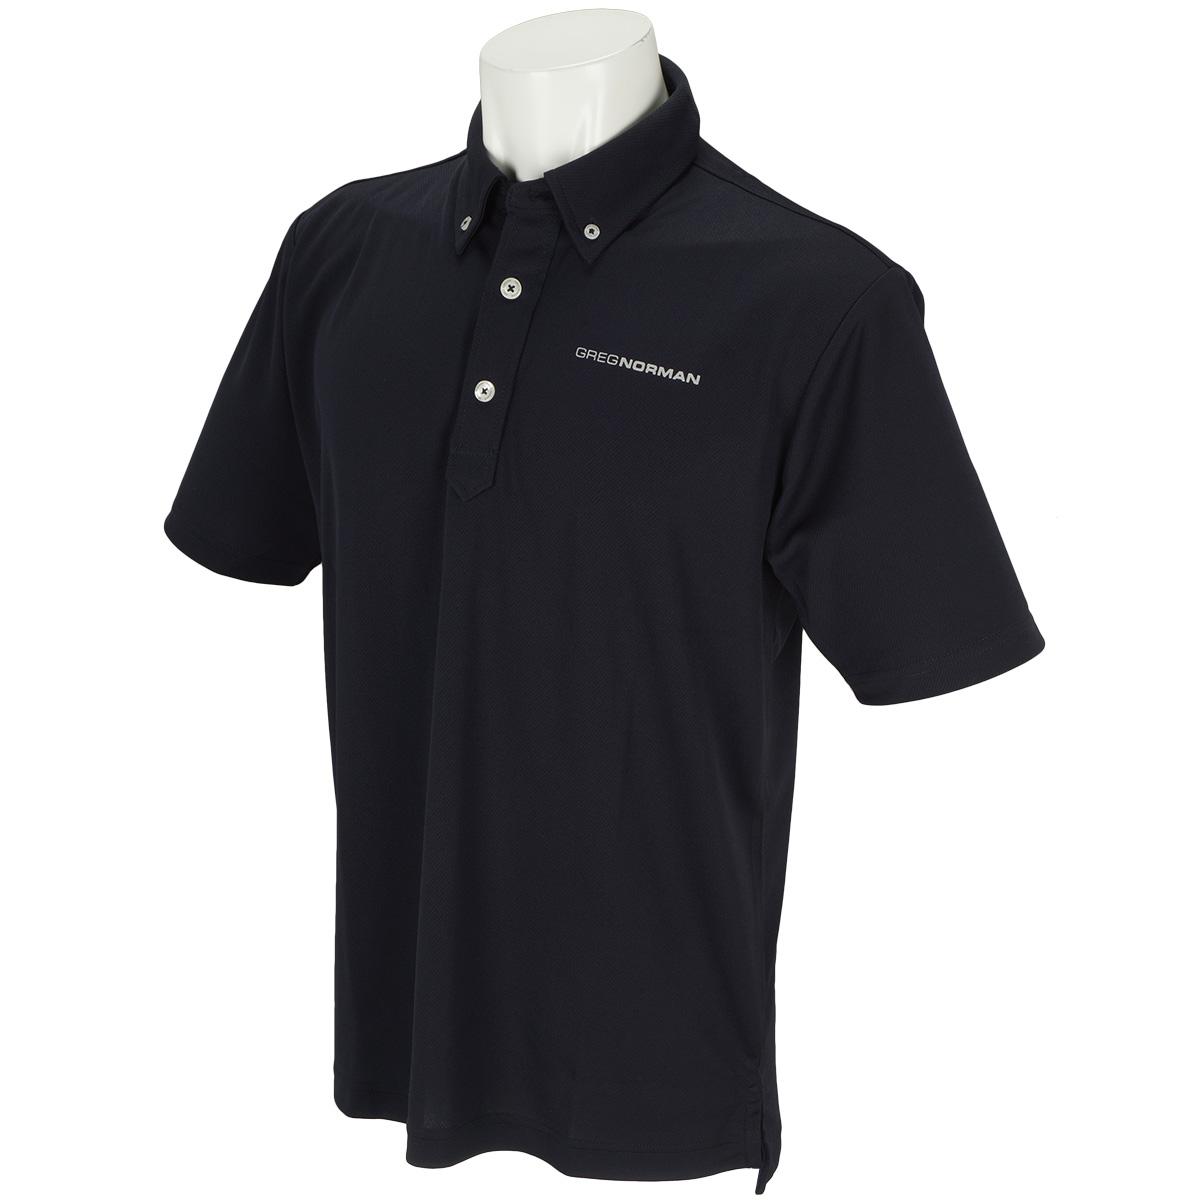 GDO限定 ボタンダウン半袖ポロシャツ